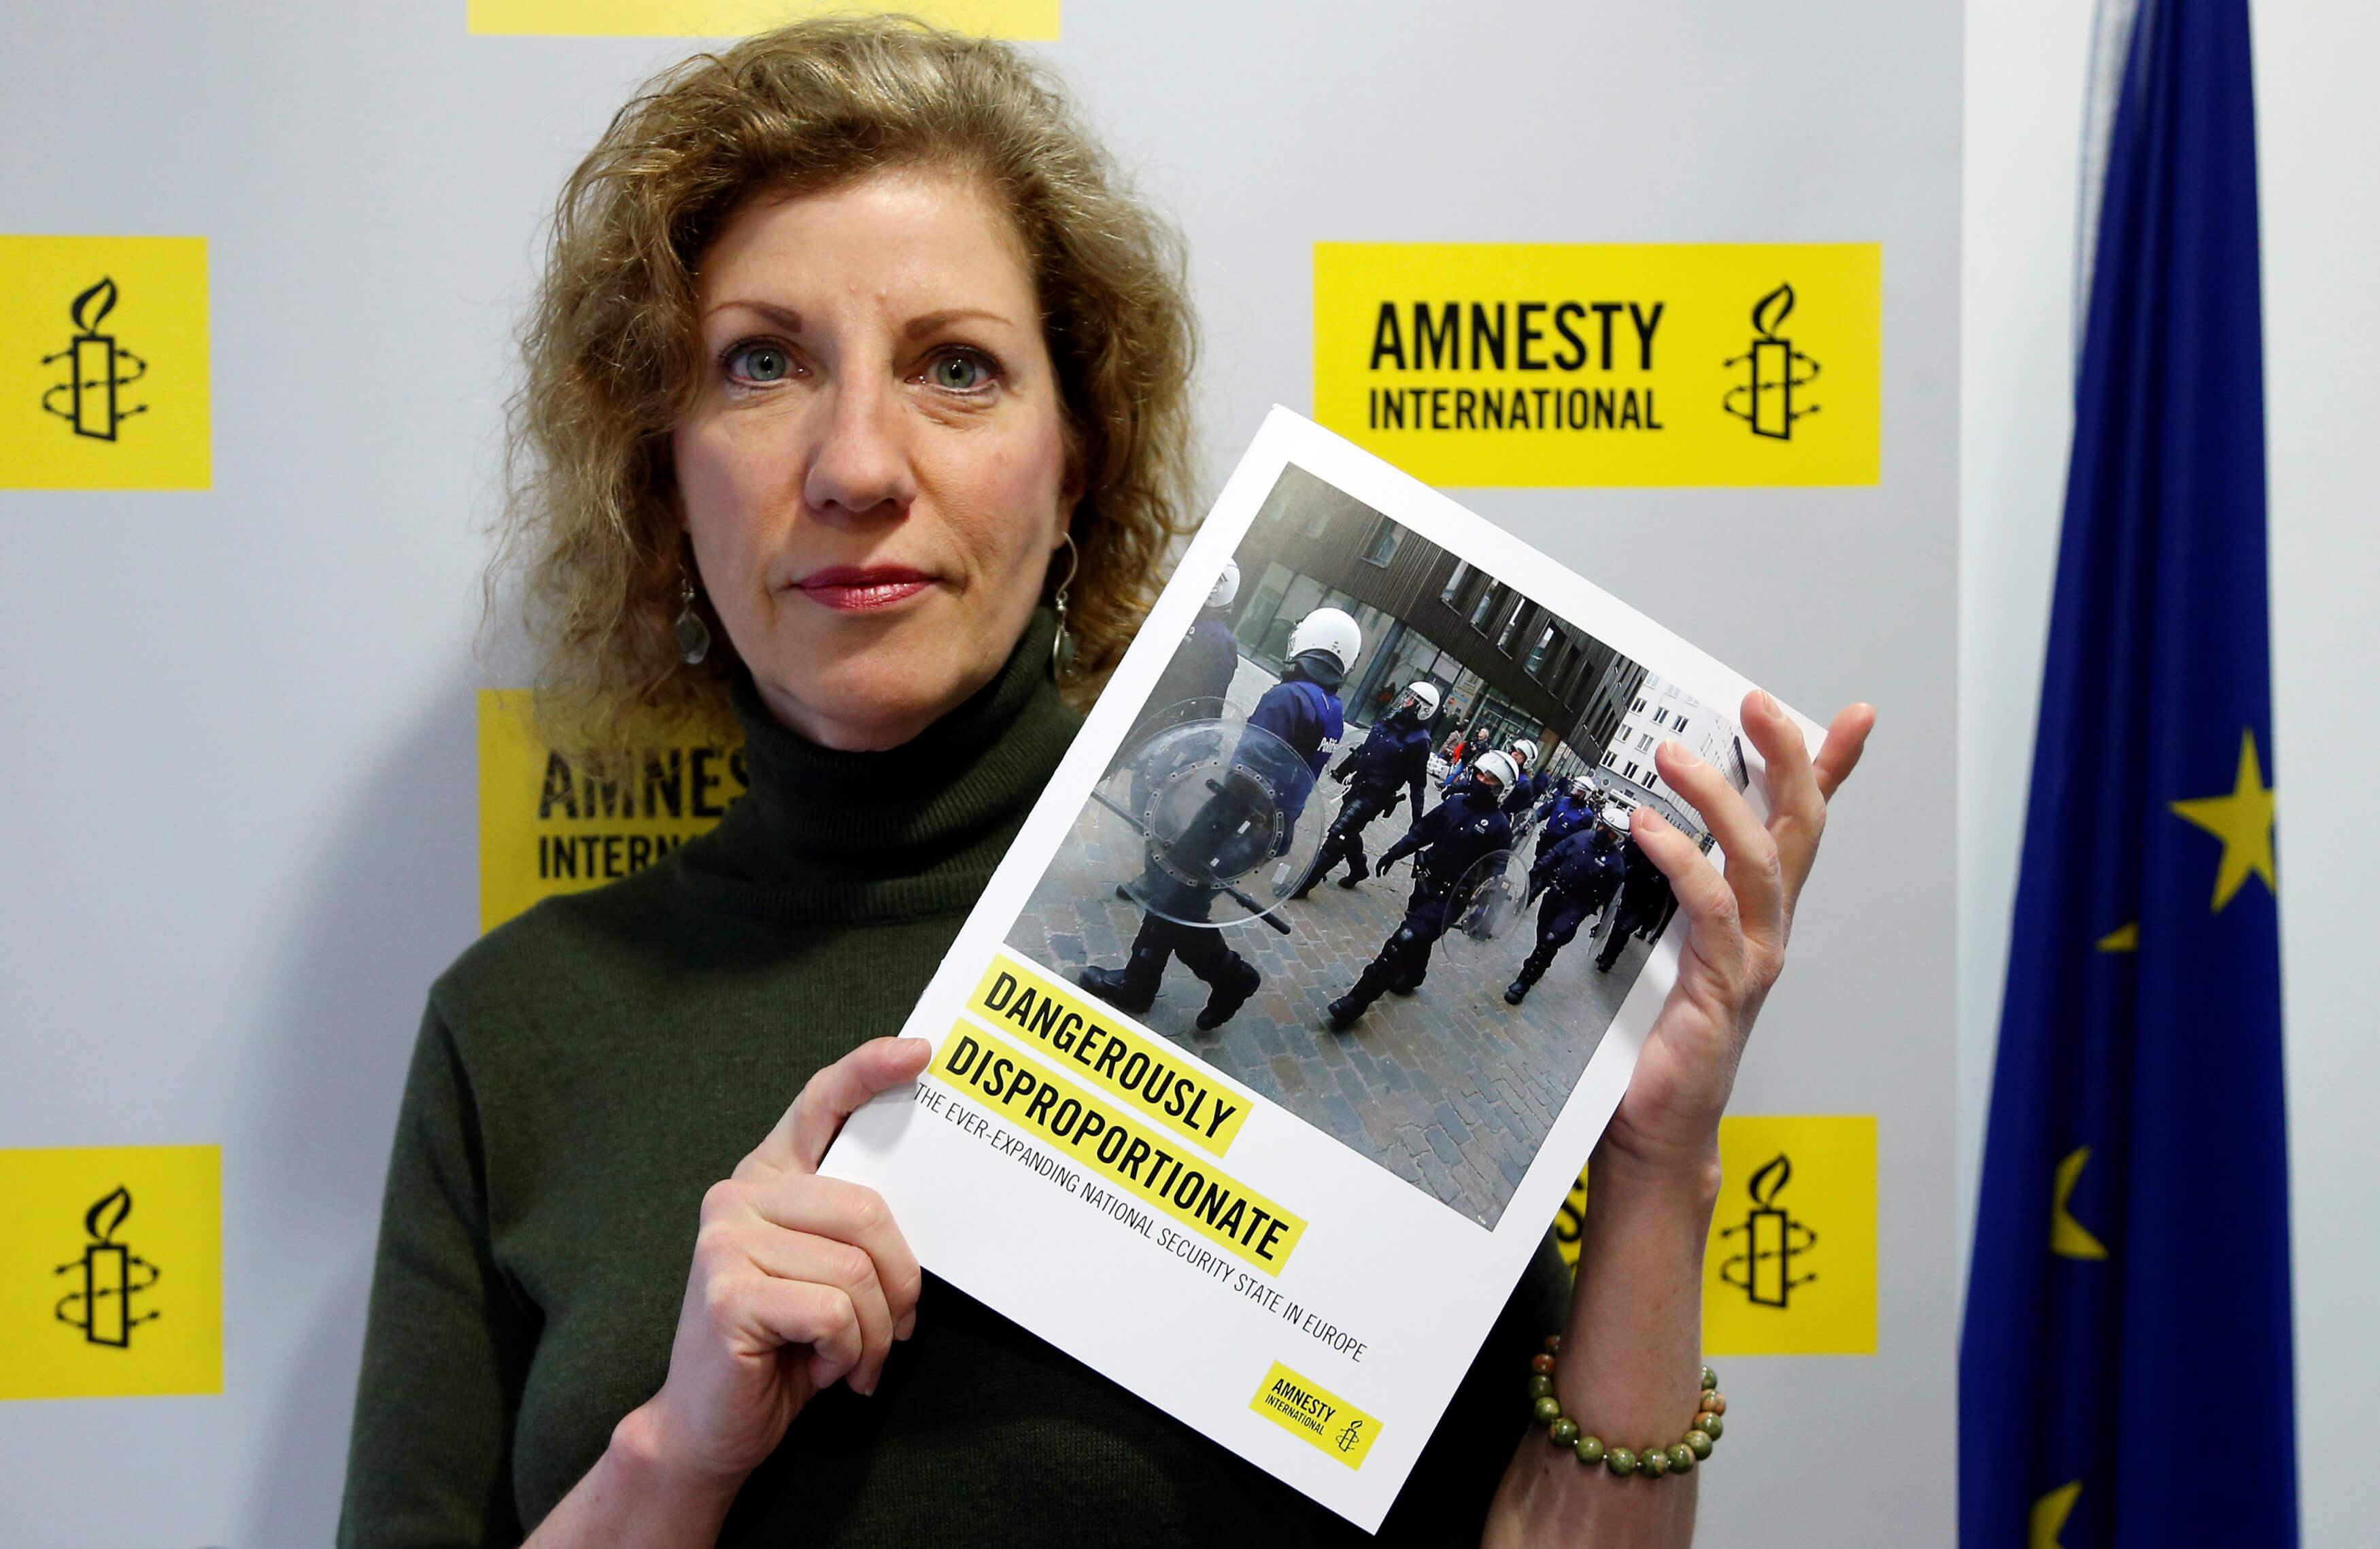 'Draconian' EU security laws target Muslims – Amnesty International